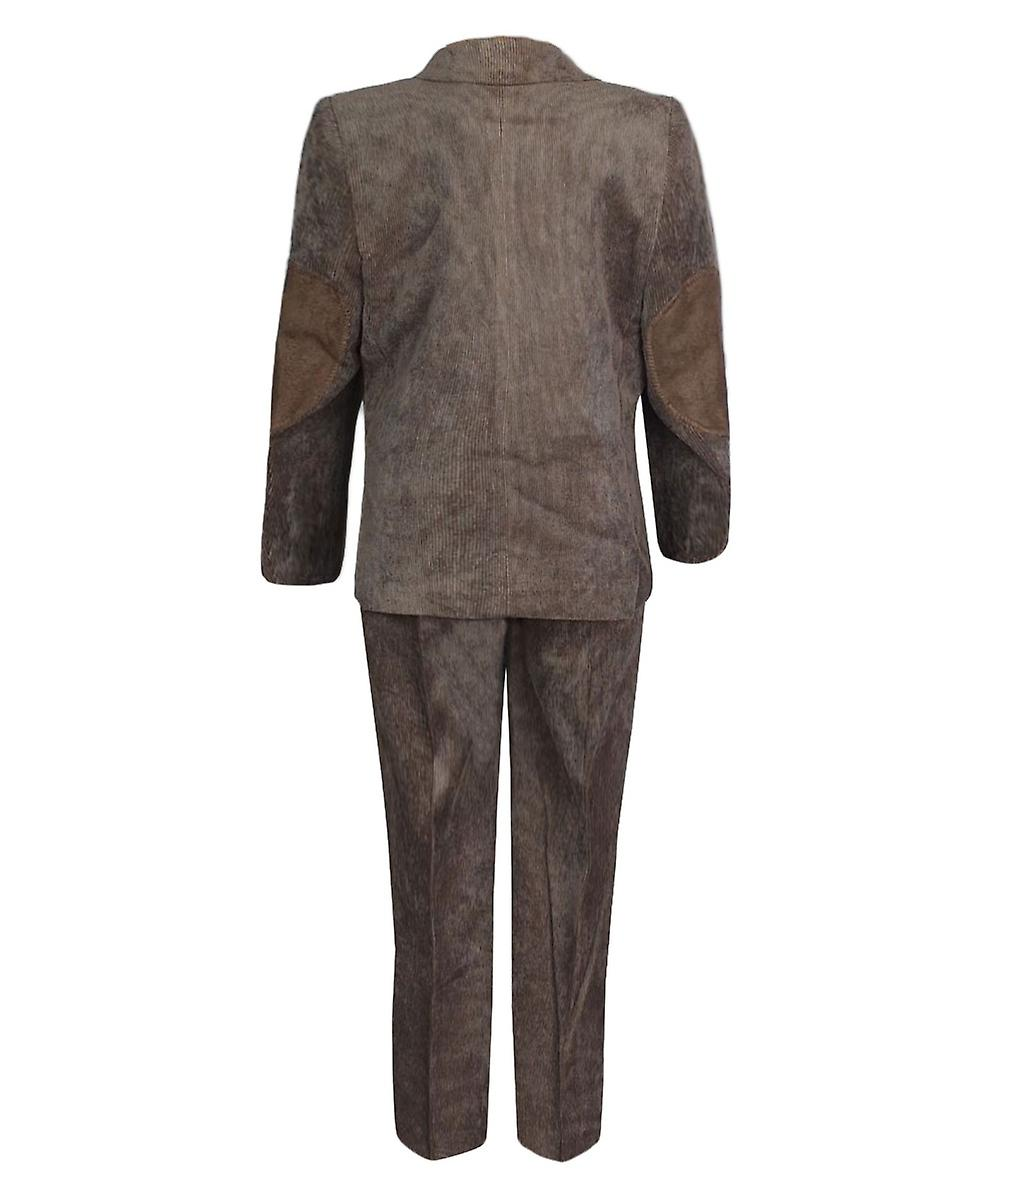 Designer Boys Brown Corduroy  4 PC Suit With Hat